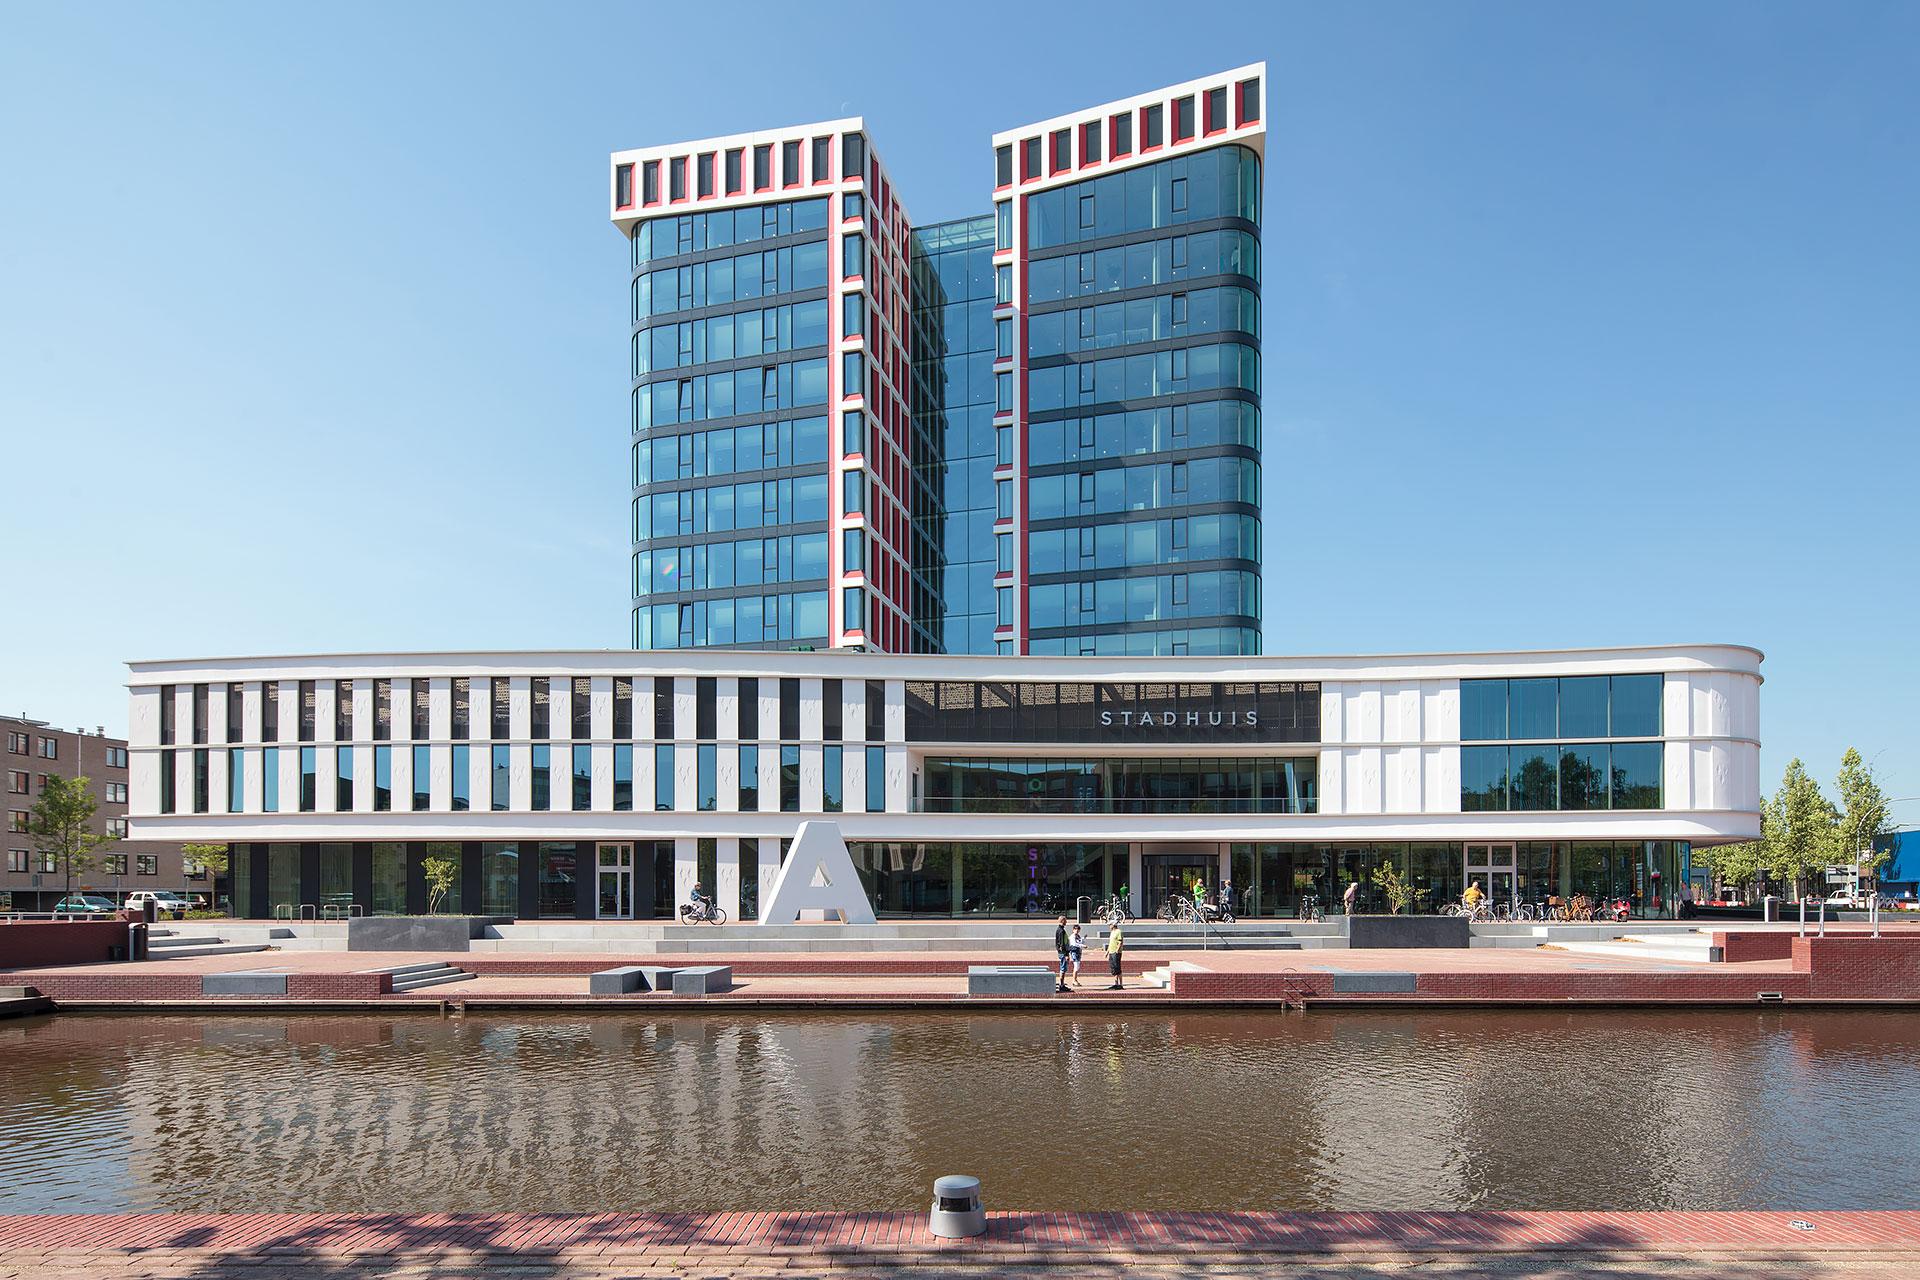 SP2015-Stadhuis-Almelo-architectuurfoto-02